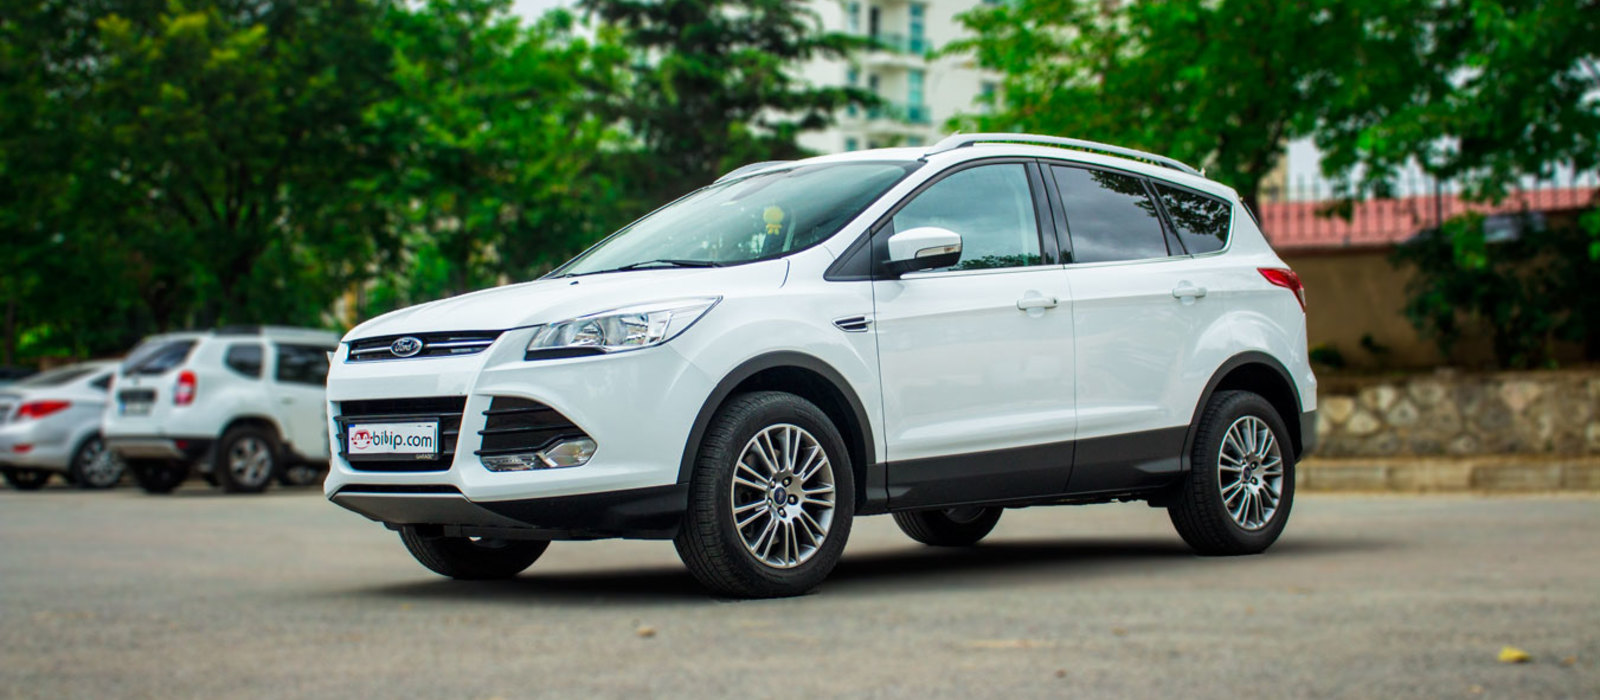 ikinci el araba 2014 Ford Kuga 1.6 EcoBoost Titanium Benzin Otomatik 14000 KM